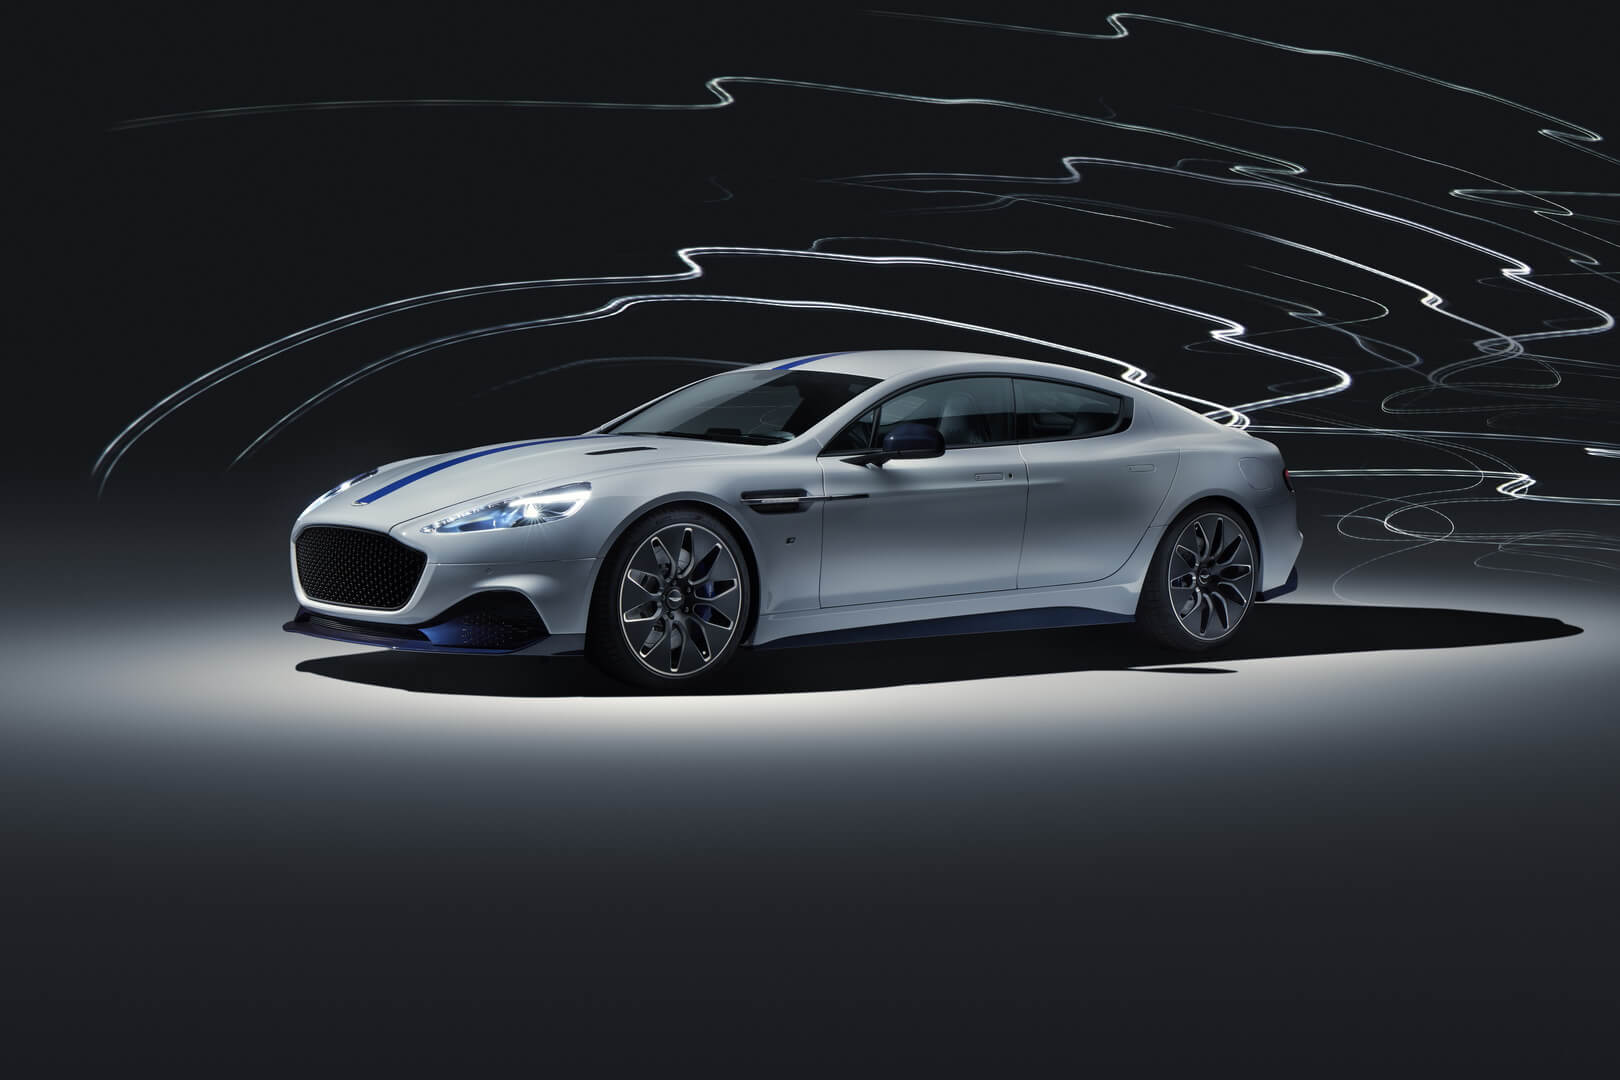 Aston Martin Rapide E дебютировал на автосалоне в Шанхае